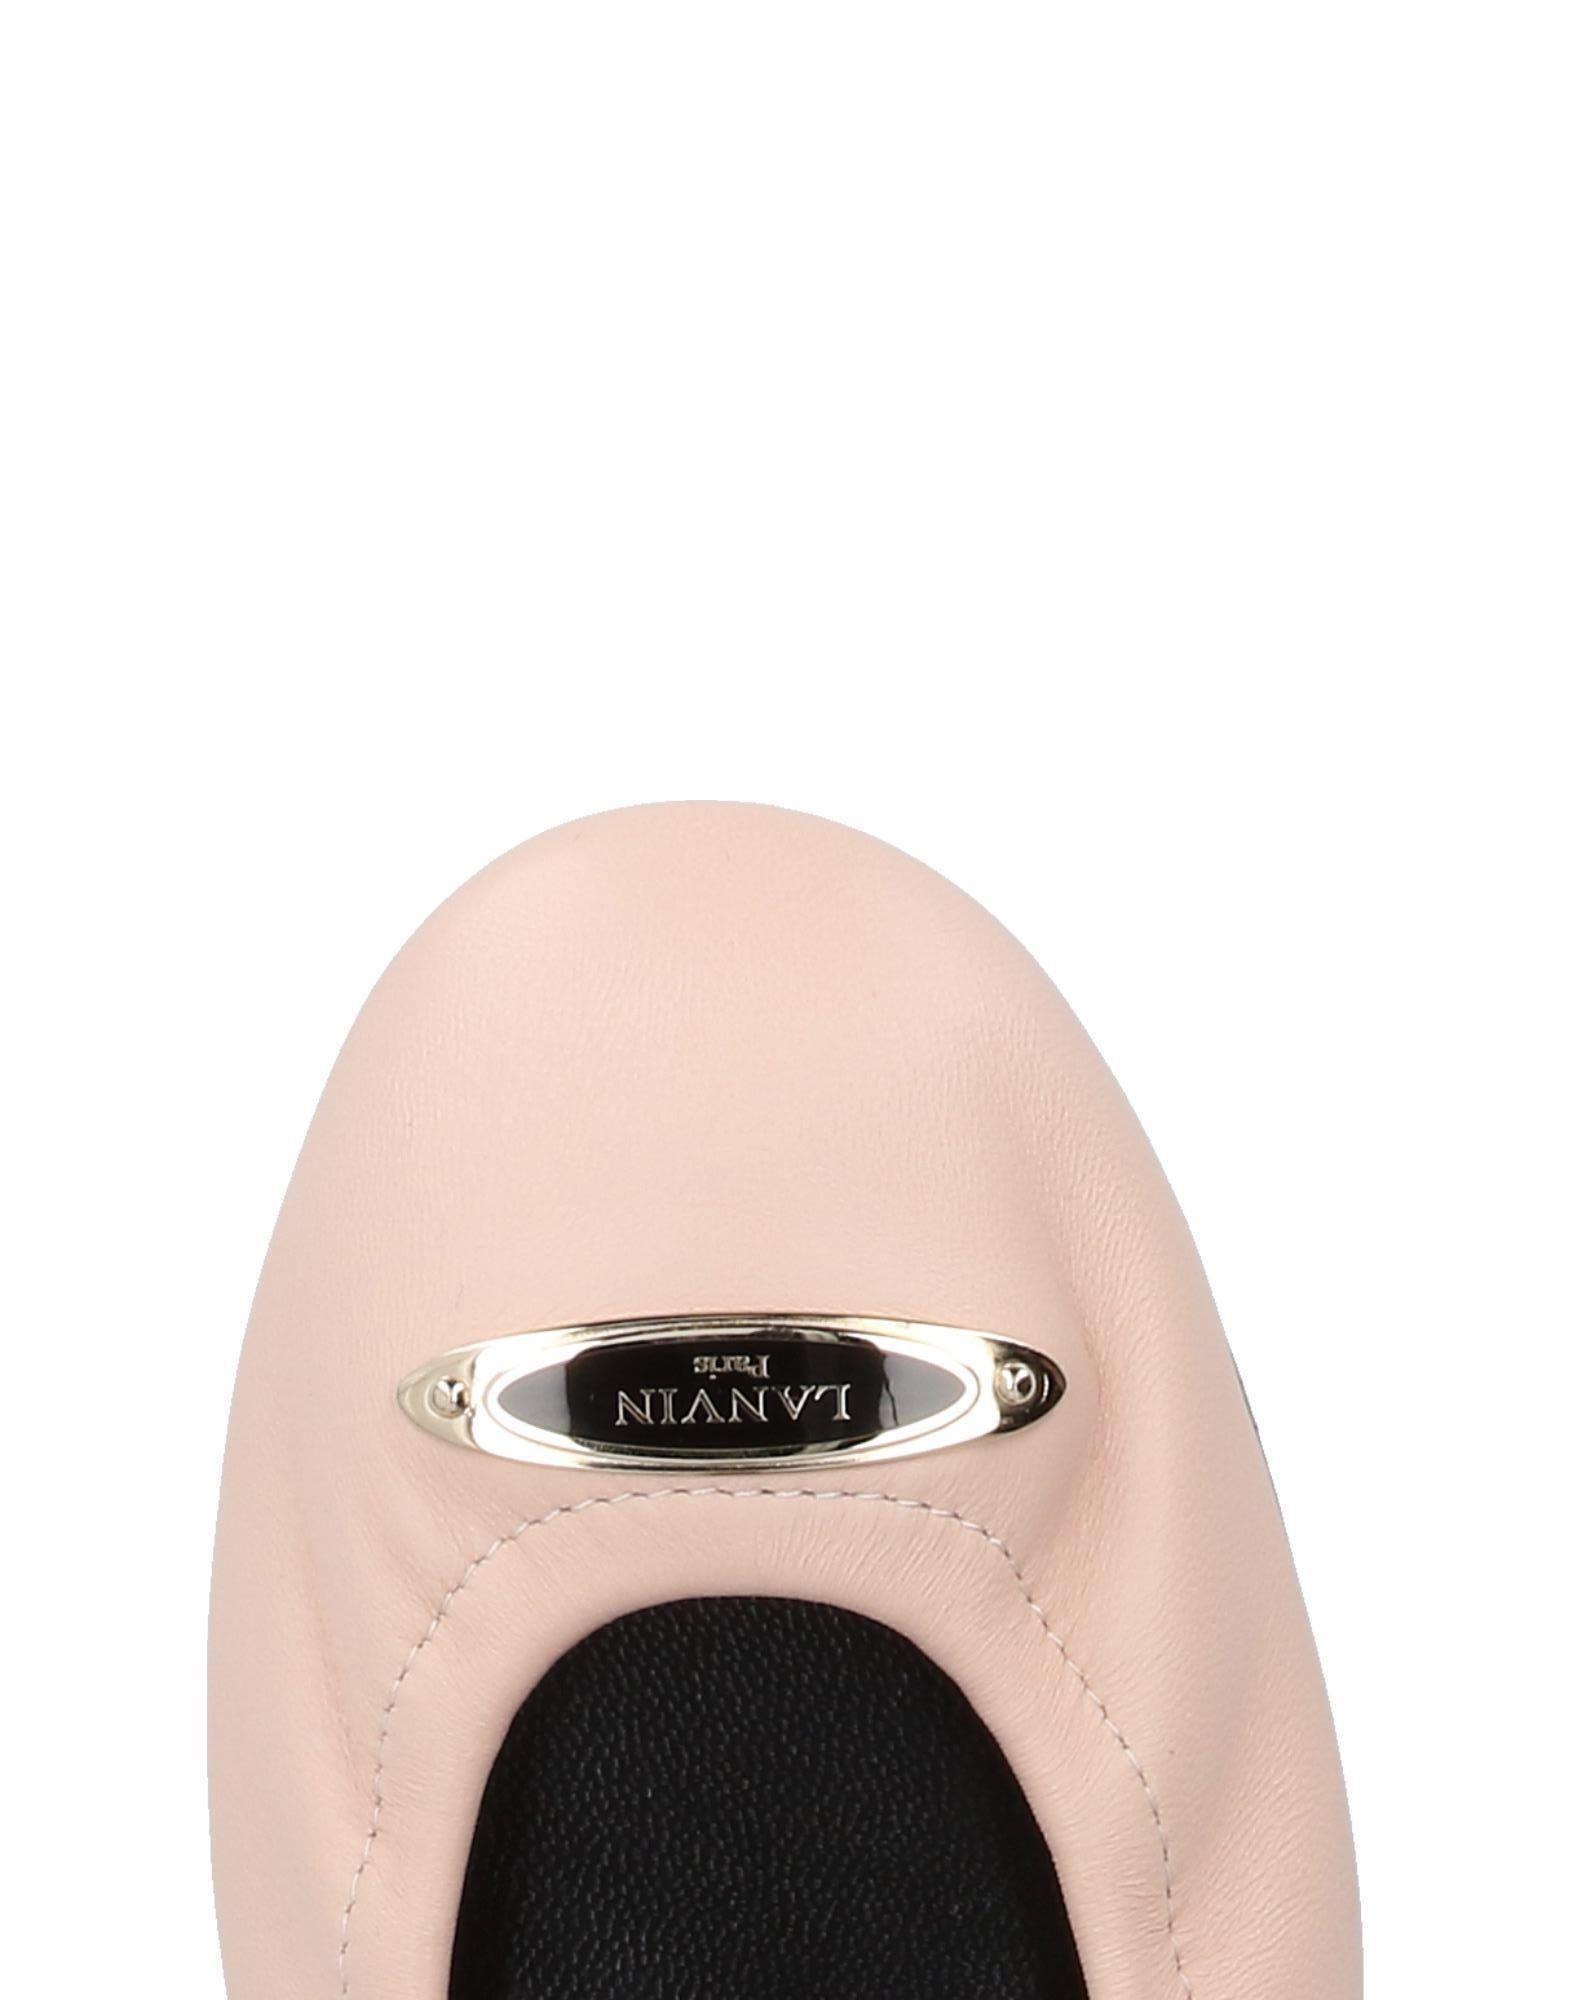 Lanvin Ballerinas Damen Heiße  11445704EM Heiße Damen Schuhe 892a36